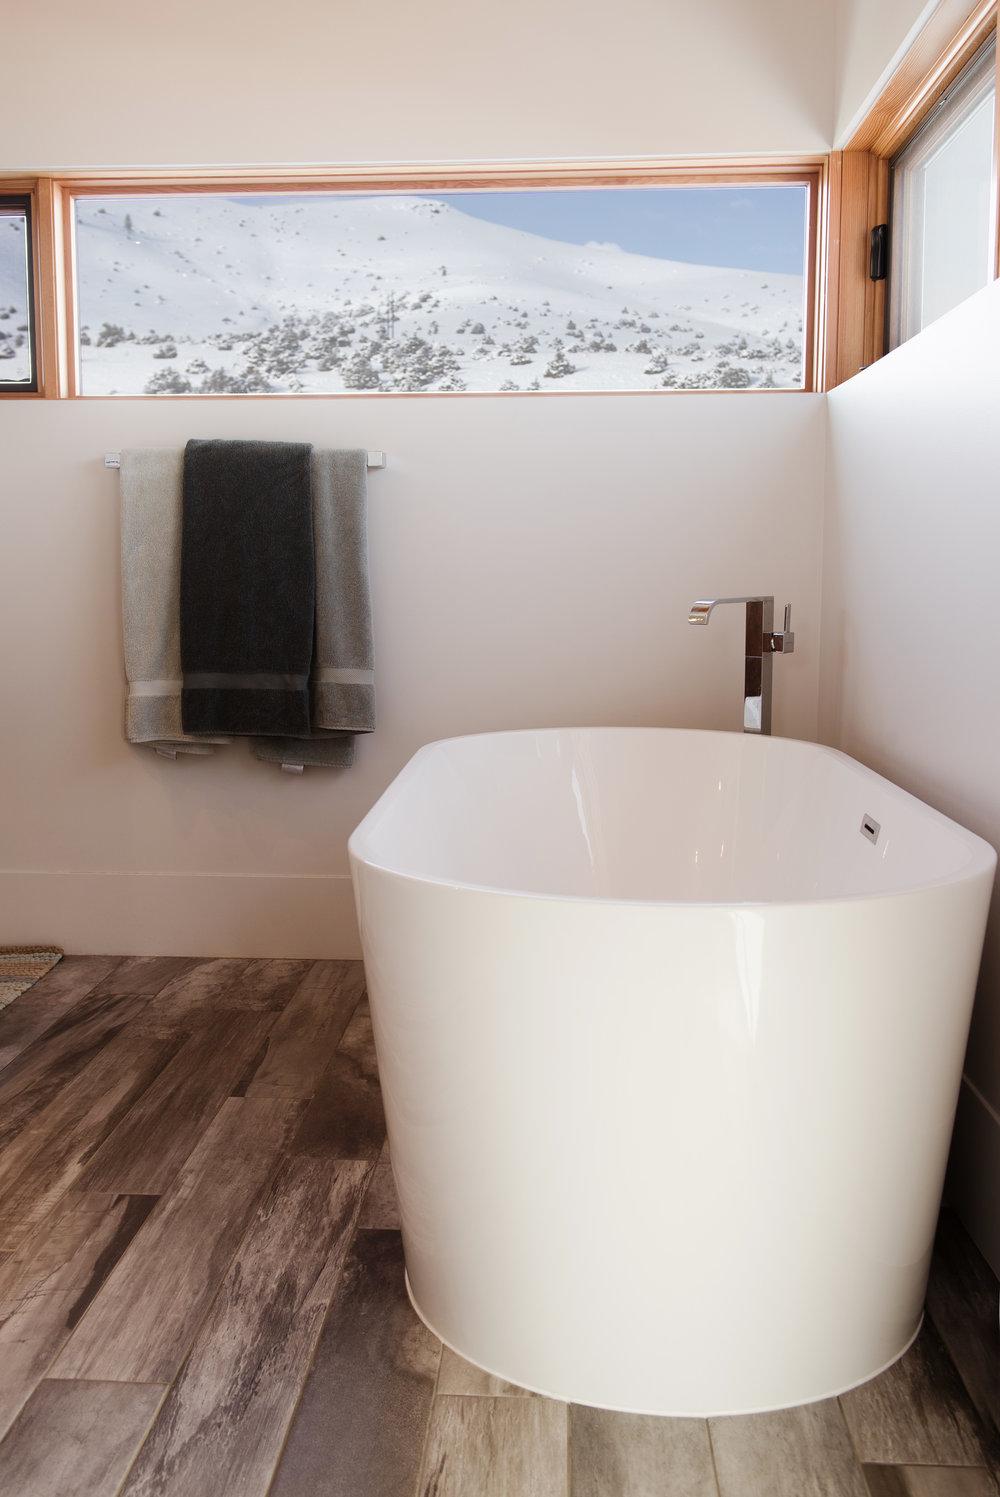 Woodworks-West-Bozeman-Montana-Builder-Cabinetry-Remodel-New-Construction-4434.jpg